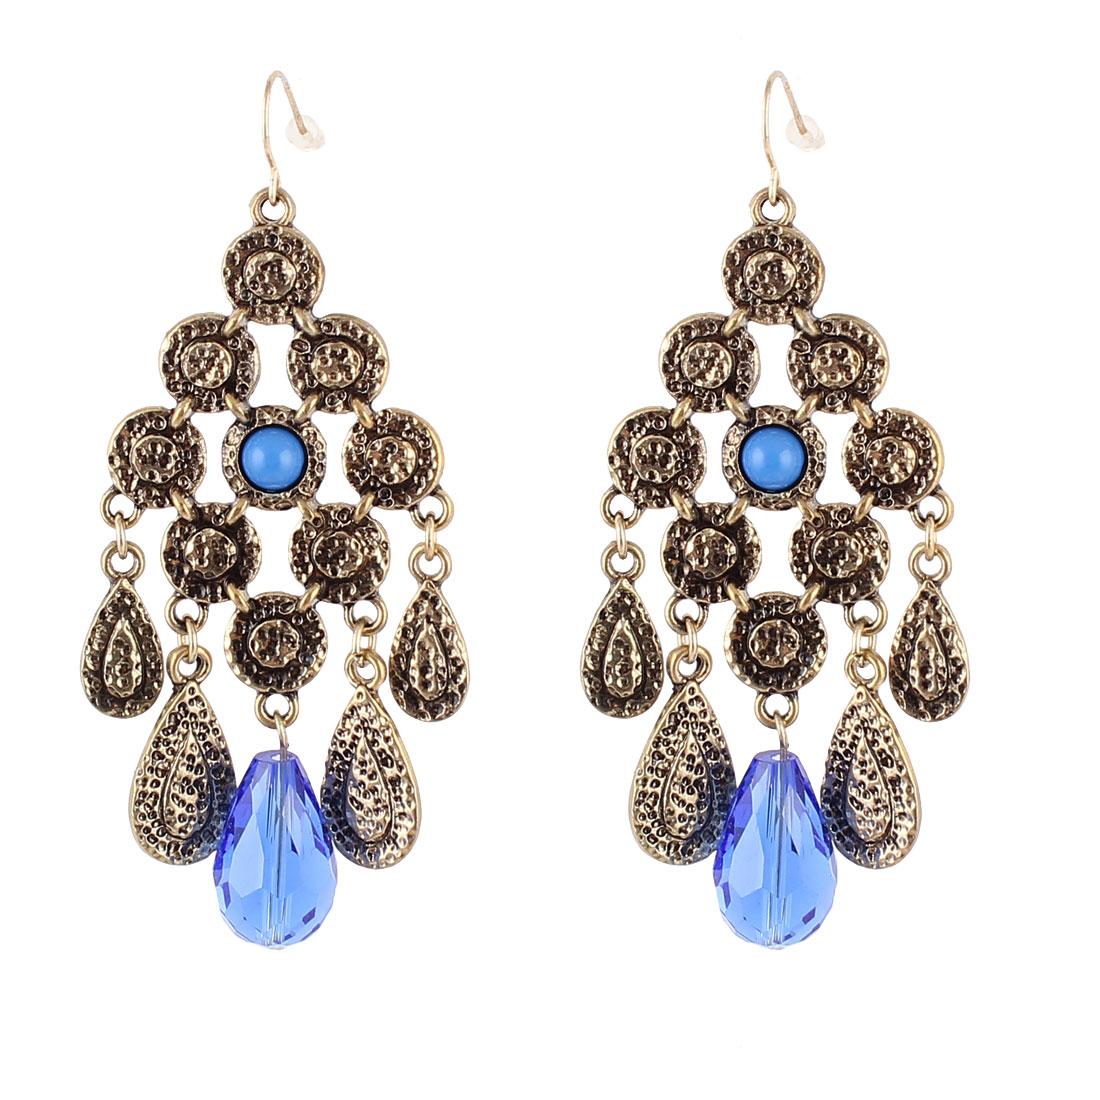 "Woman Blue Plastic Rhinestone Pendant Rhombus Shape Metal Fish Hook Earrings Earbob Eardrop Bronze Tone 3"" Length Pair"